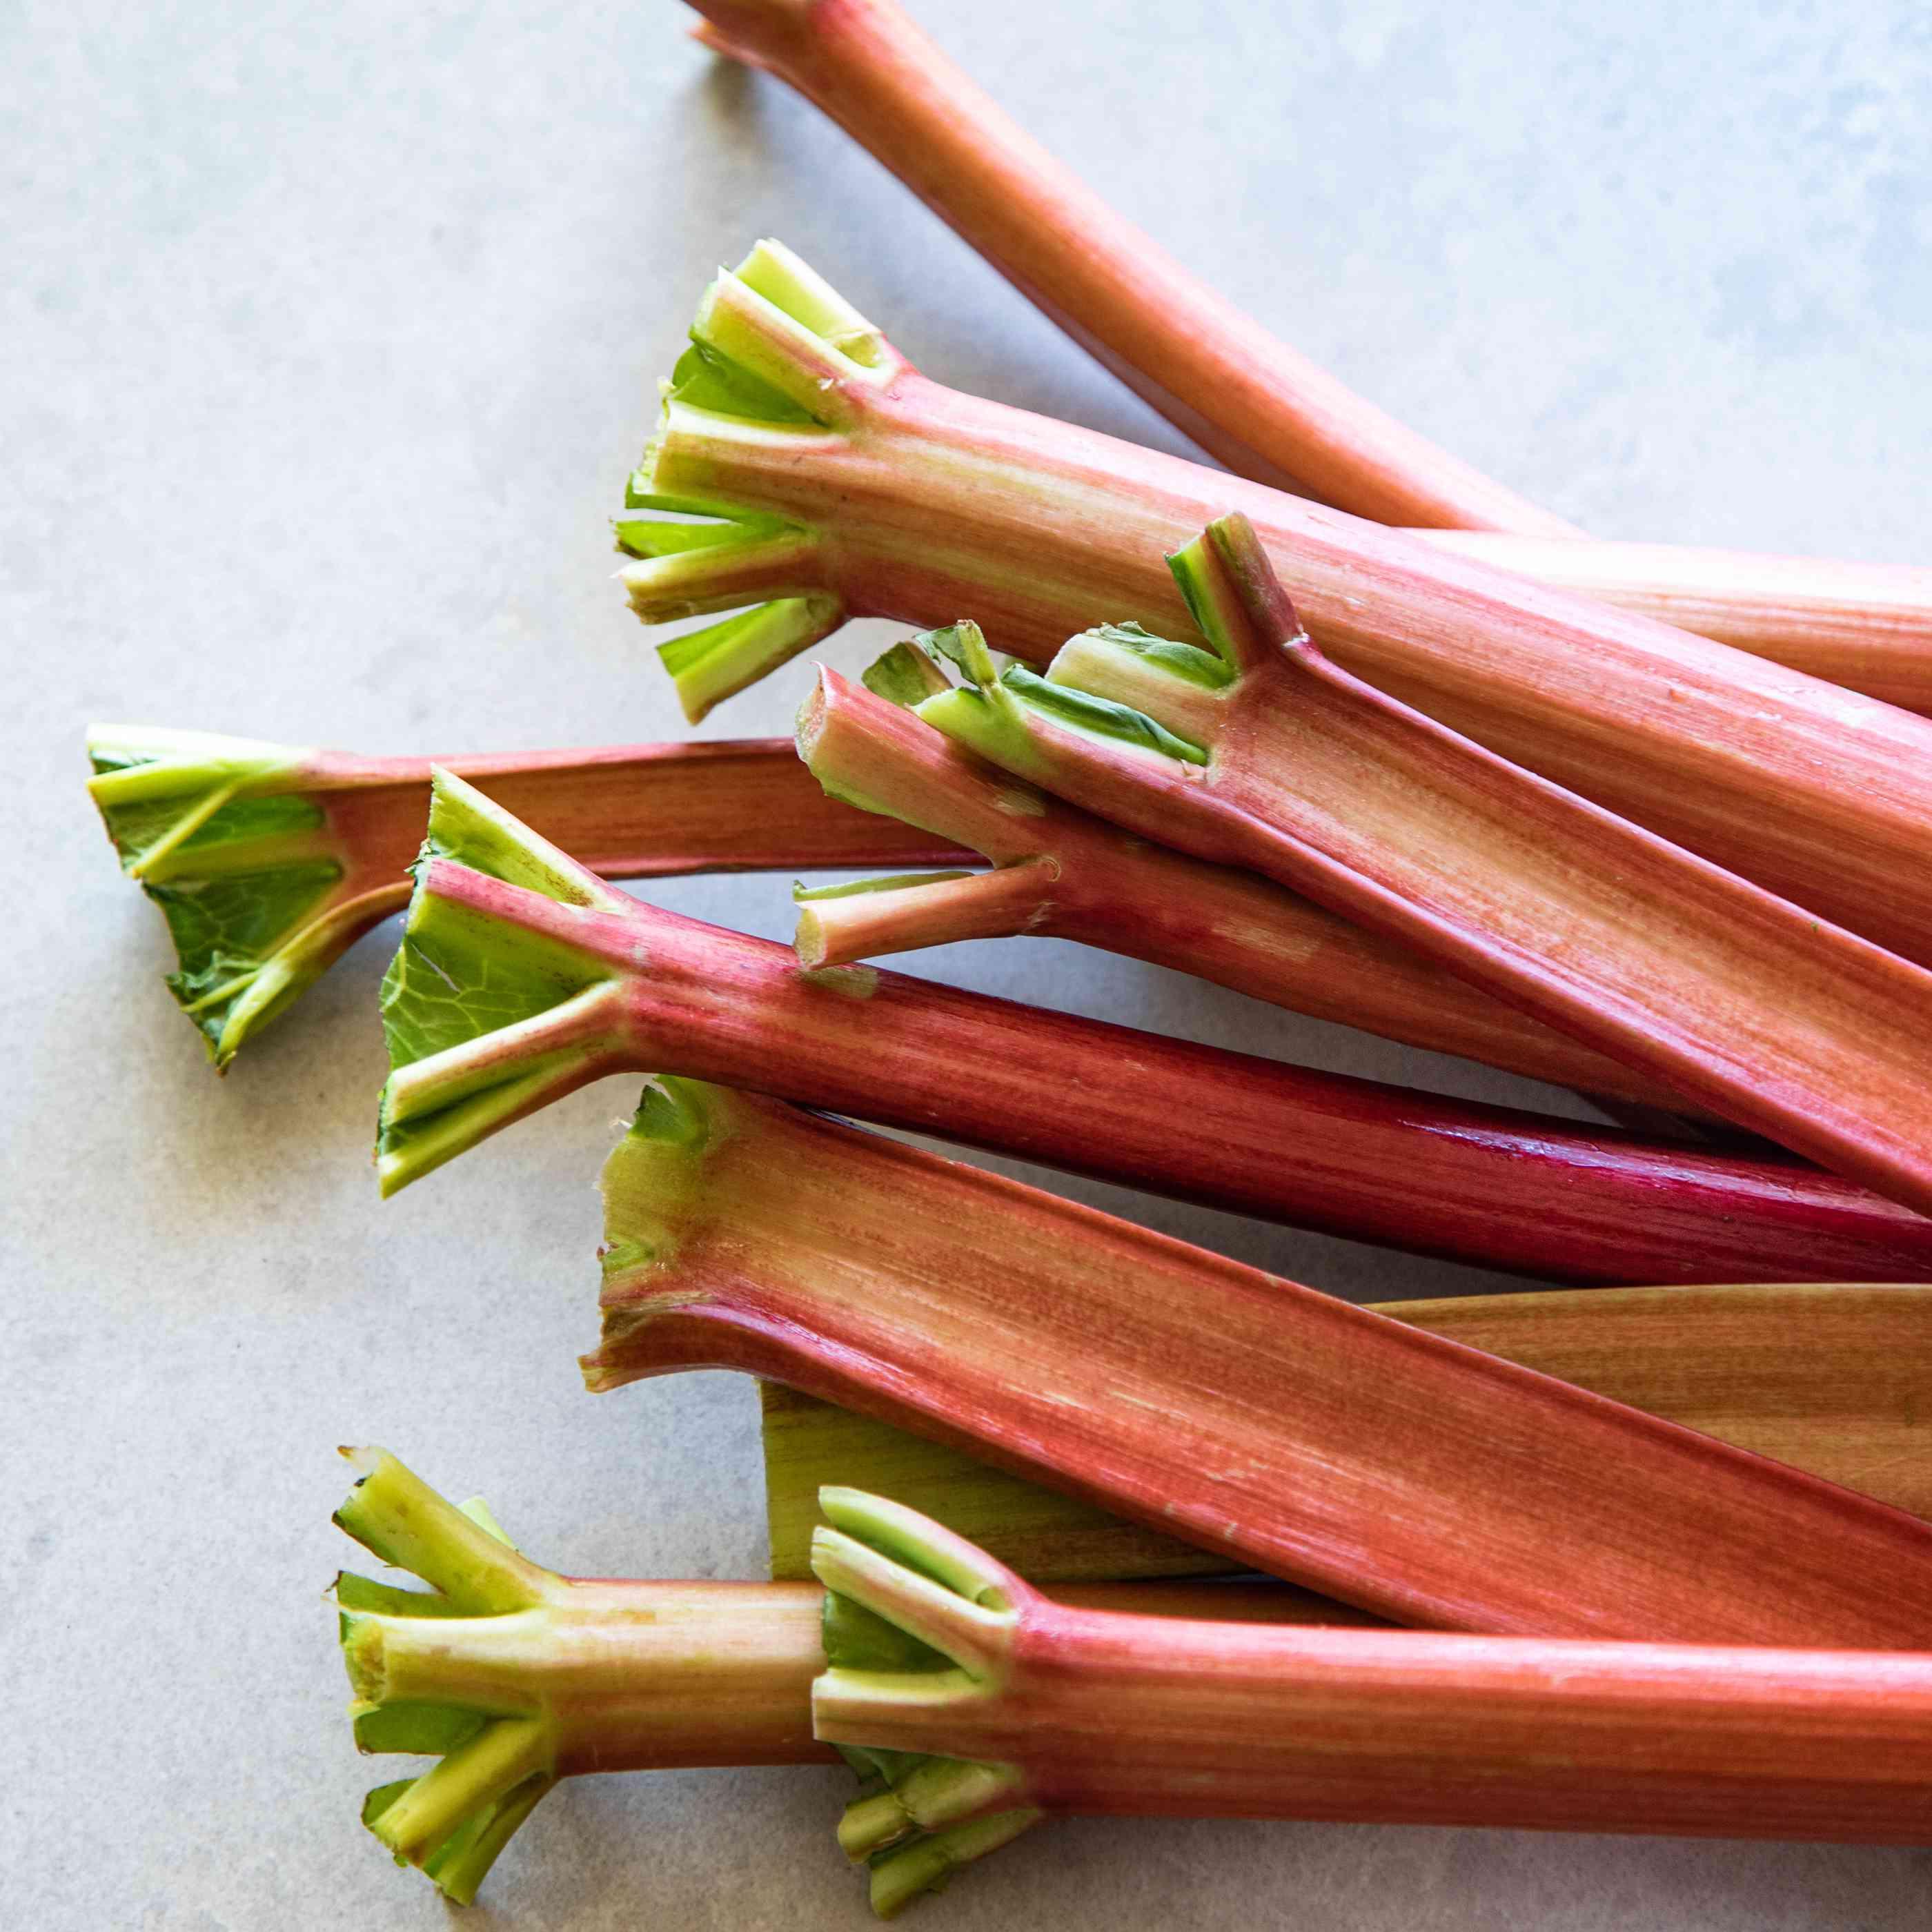 Green ends of rhubarb